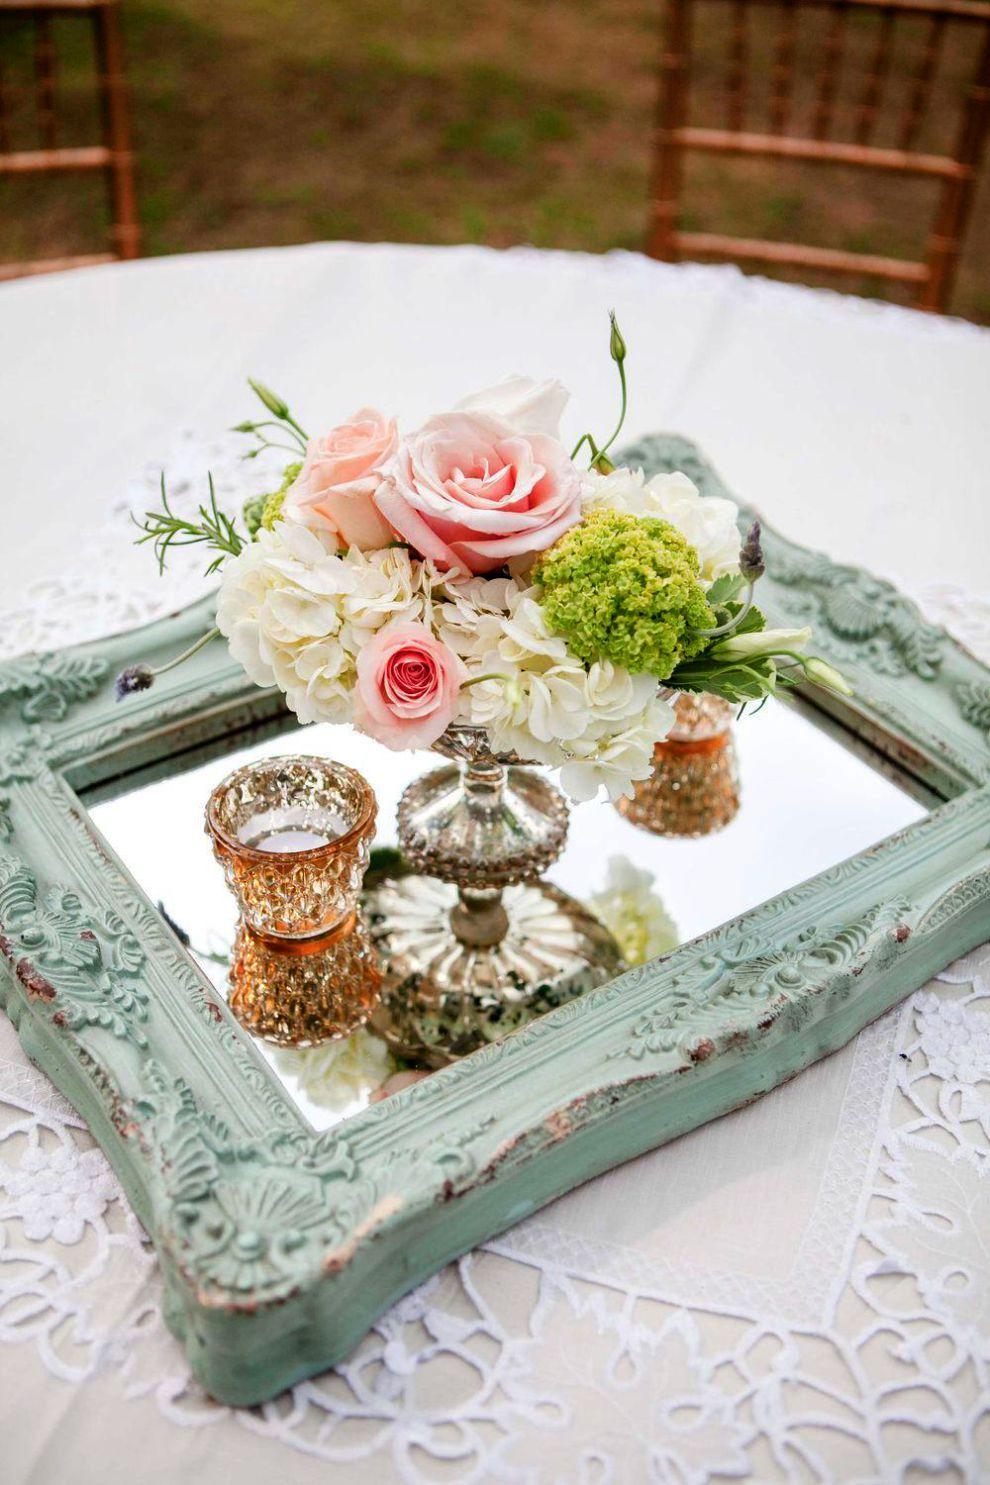 Home Decor Ideas For Small Living Room despite Home Decor Stores Novi Mi  opposi… | Romantic wedding centerpieces, Wedding centerpieces, Vintage wedding  centerpieces